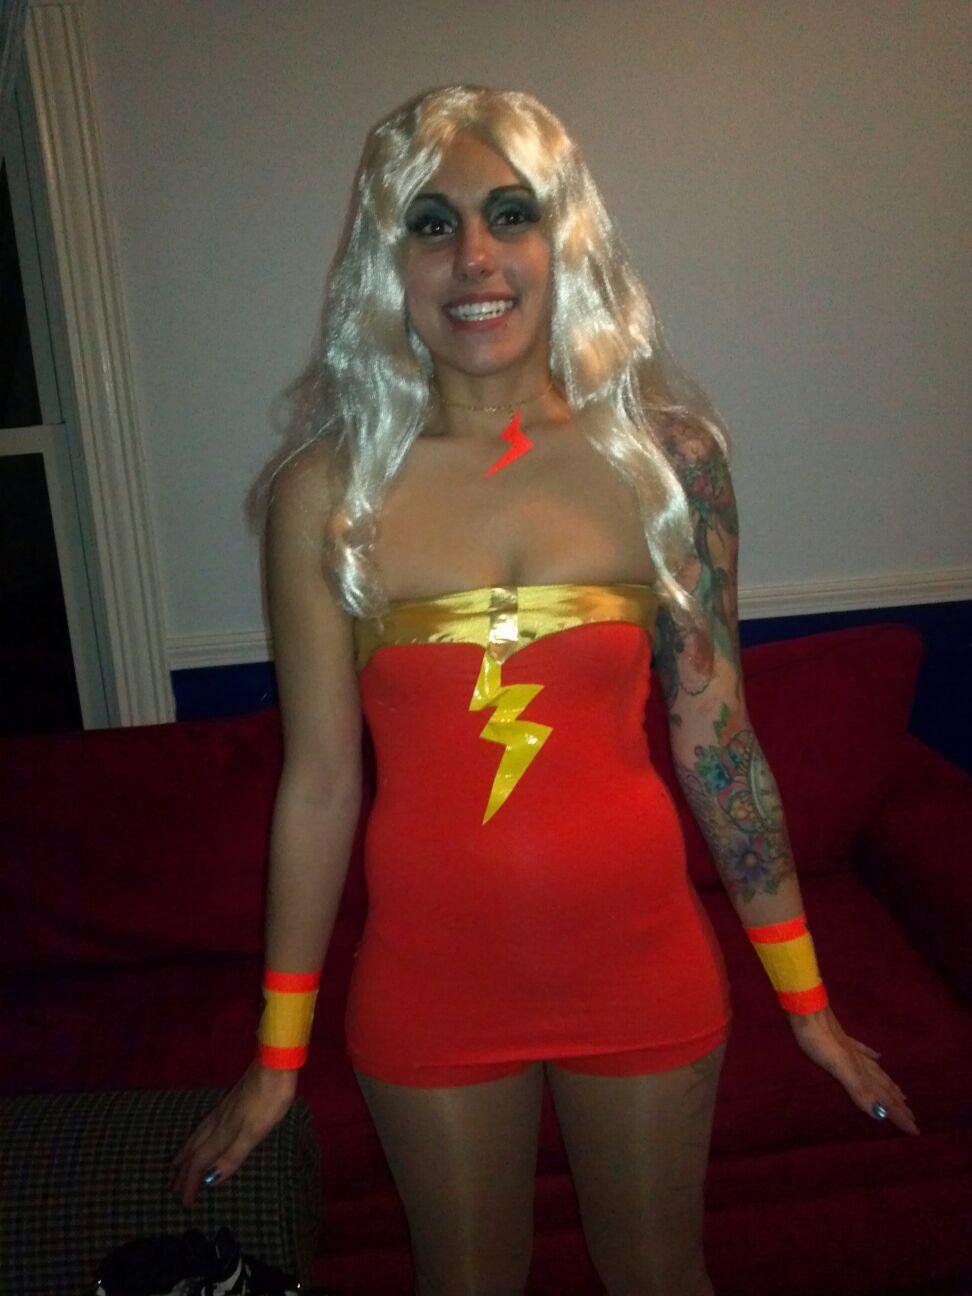 Diy costume thunder girl plastic fantastic b my costume diy costume thunder girl plastic fantastic solutioingenieria Image collections